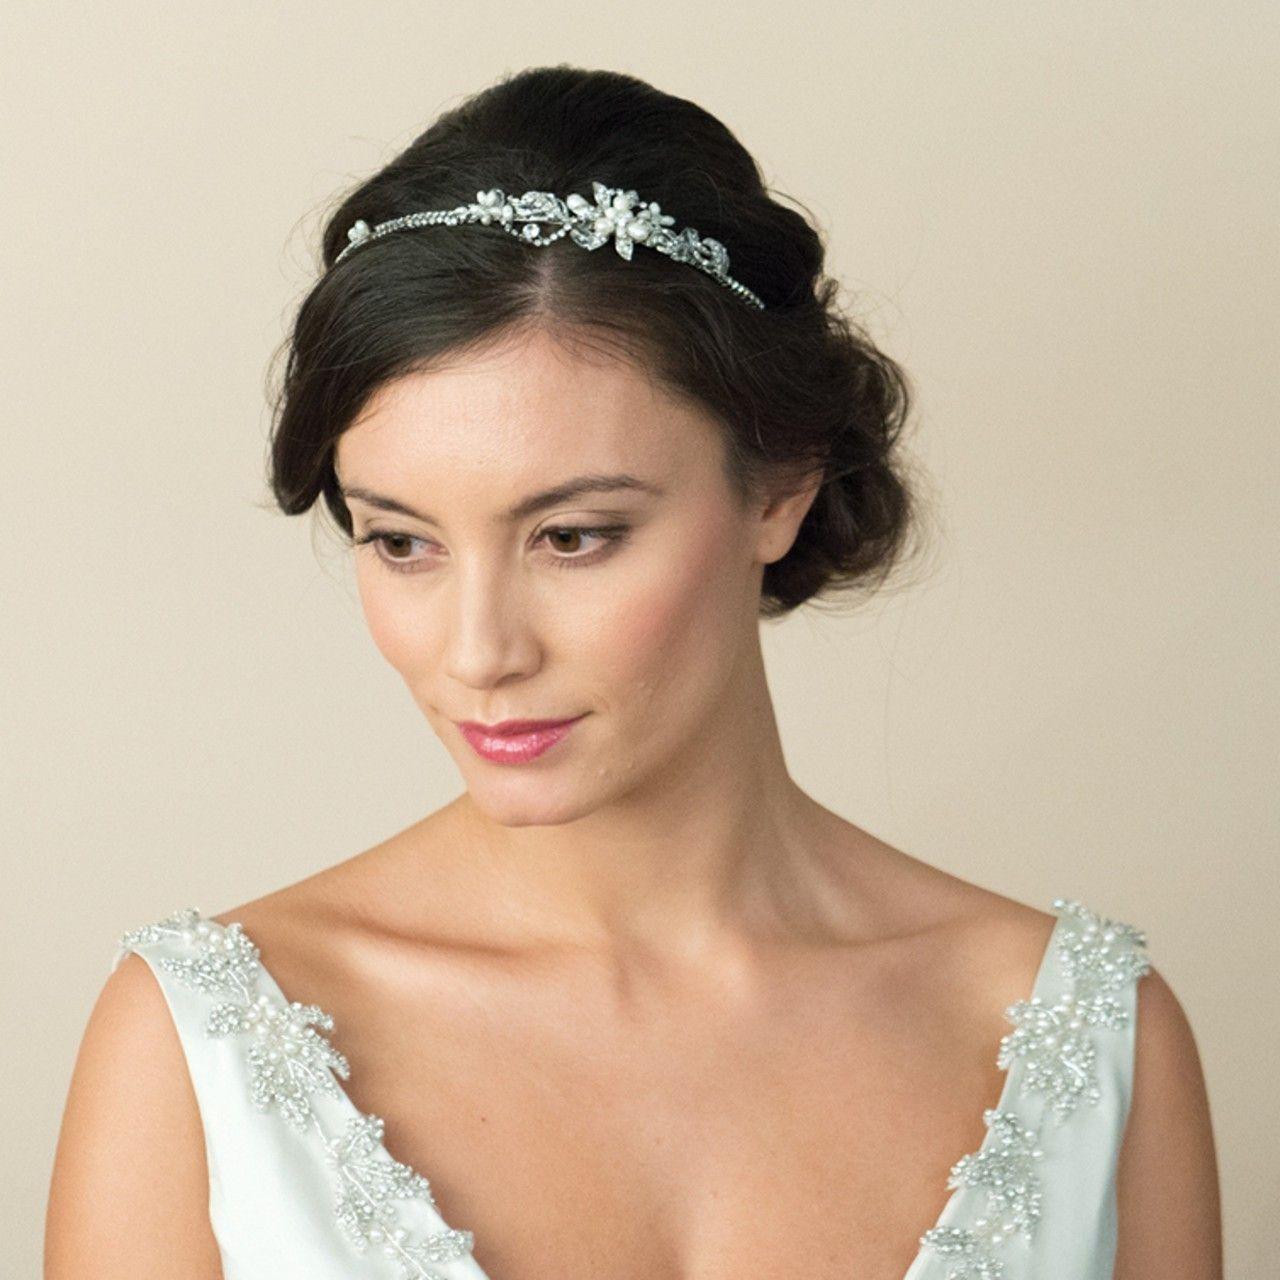 Hair accessories headbands uk - Wedding Side Headband With Fine Diamante Detailing